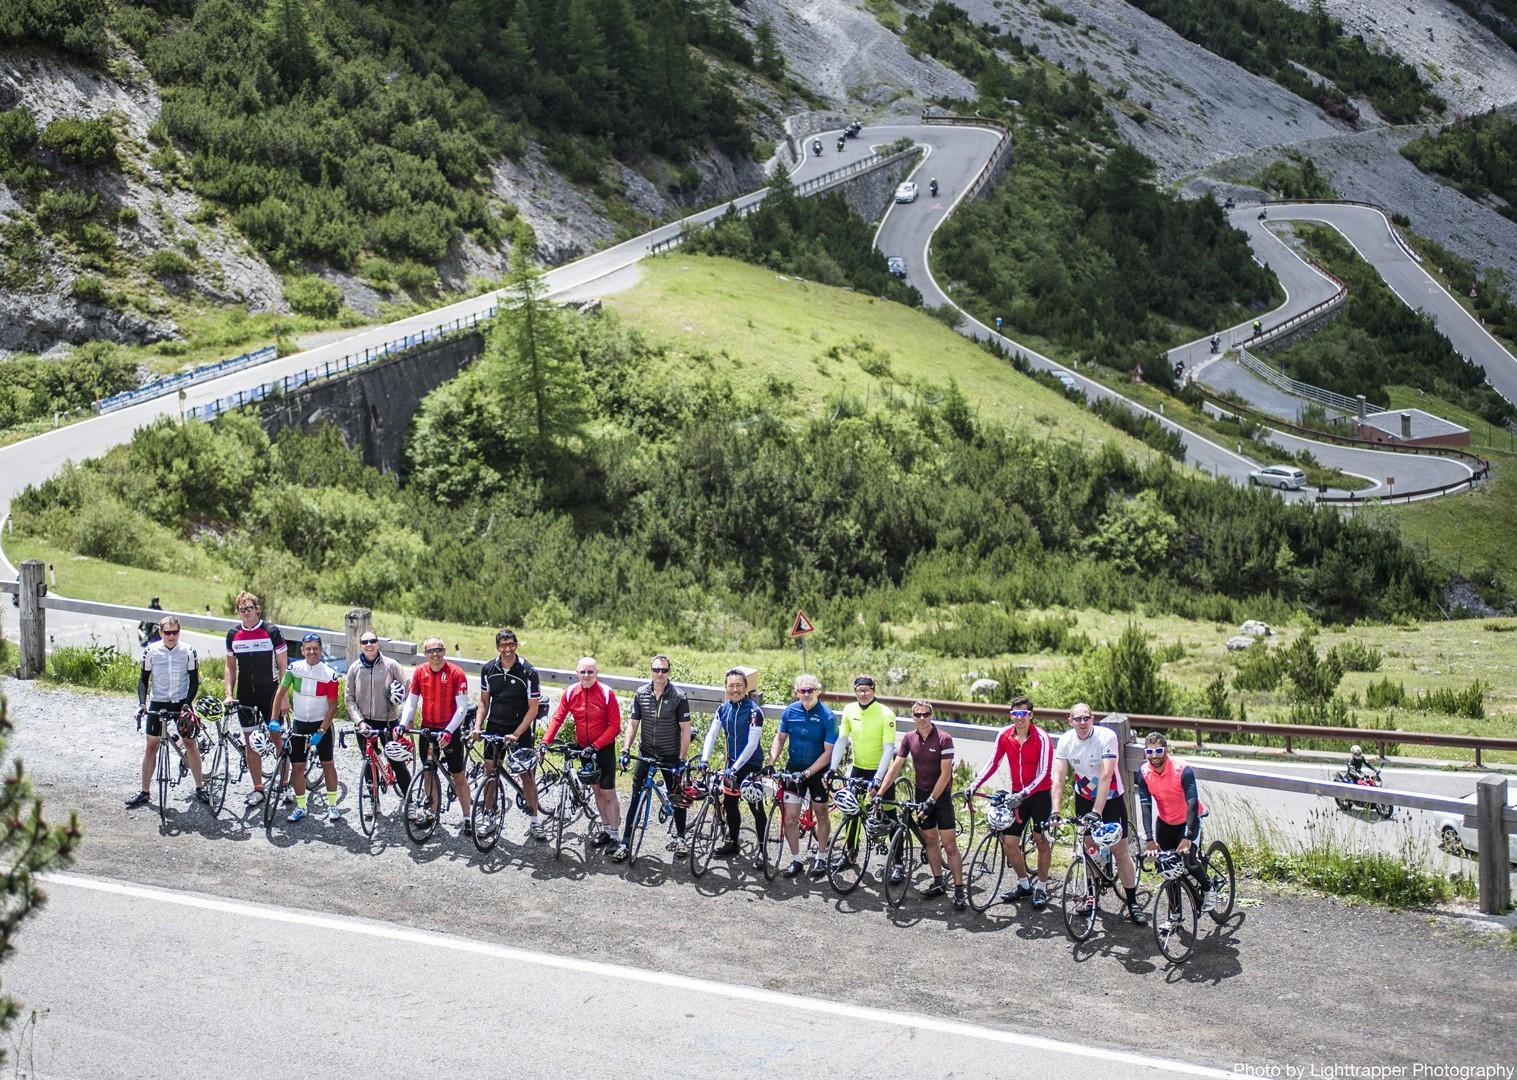 italian-alps-stelvio-guided-road-cycling-holiday.jpg - Italy - Italian Alps - Guided Road Cycling Holiday - Italia Road Cycling